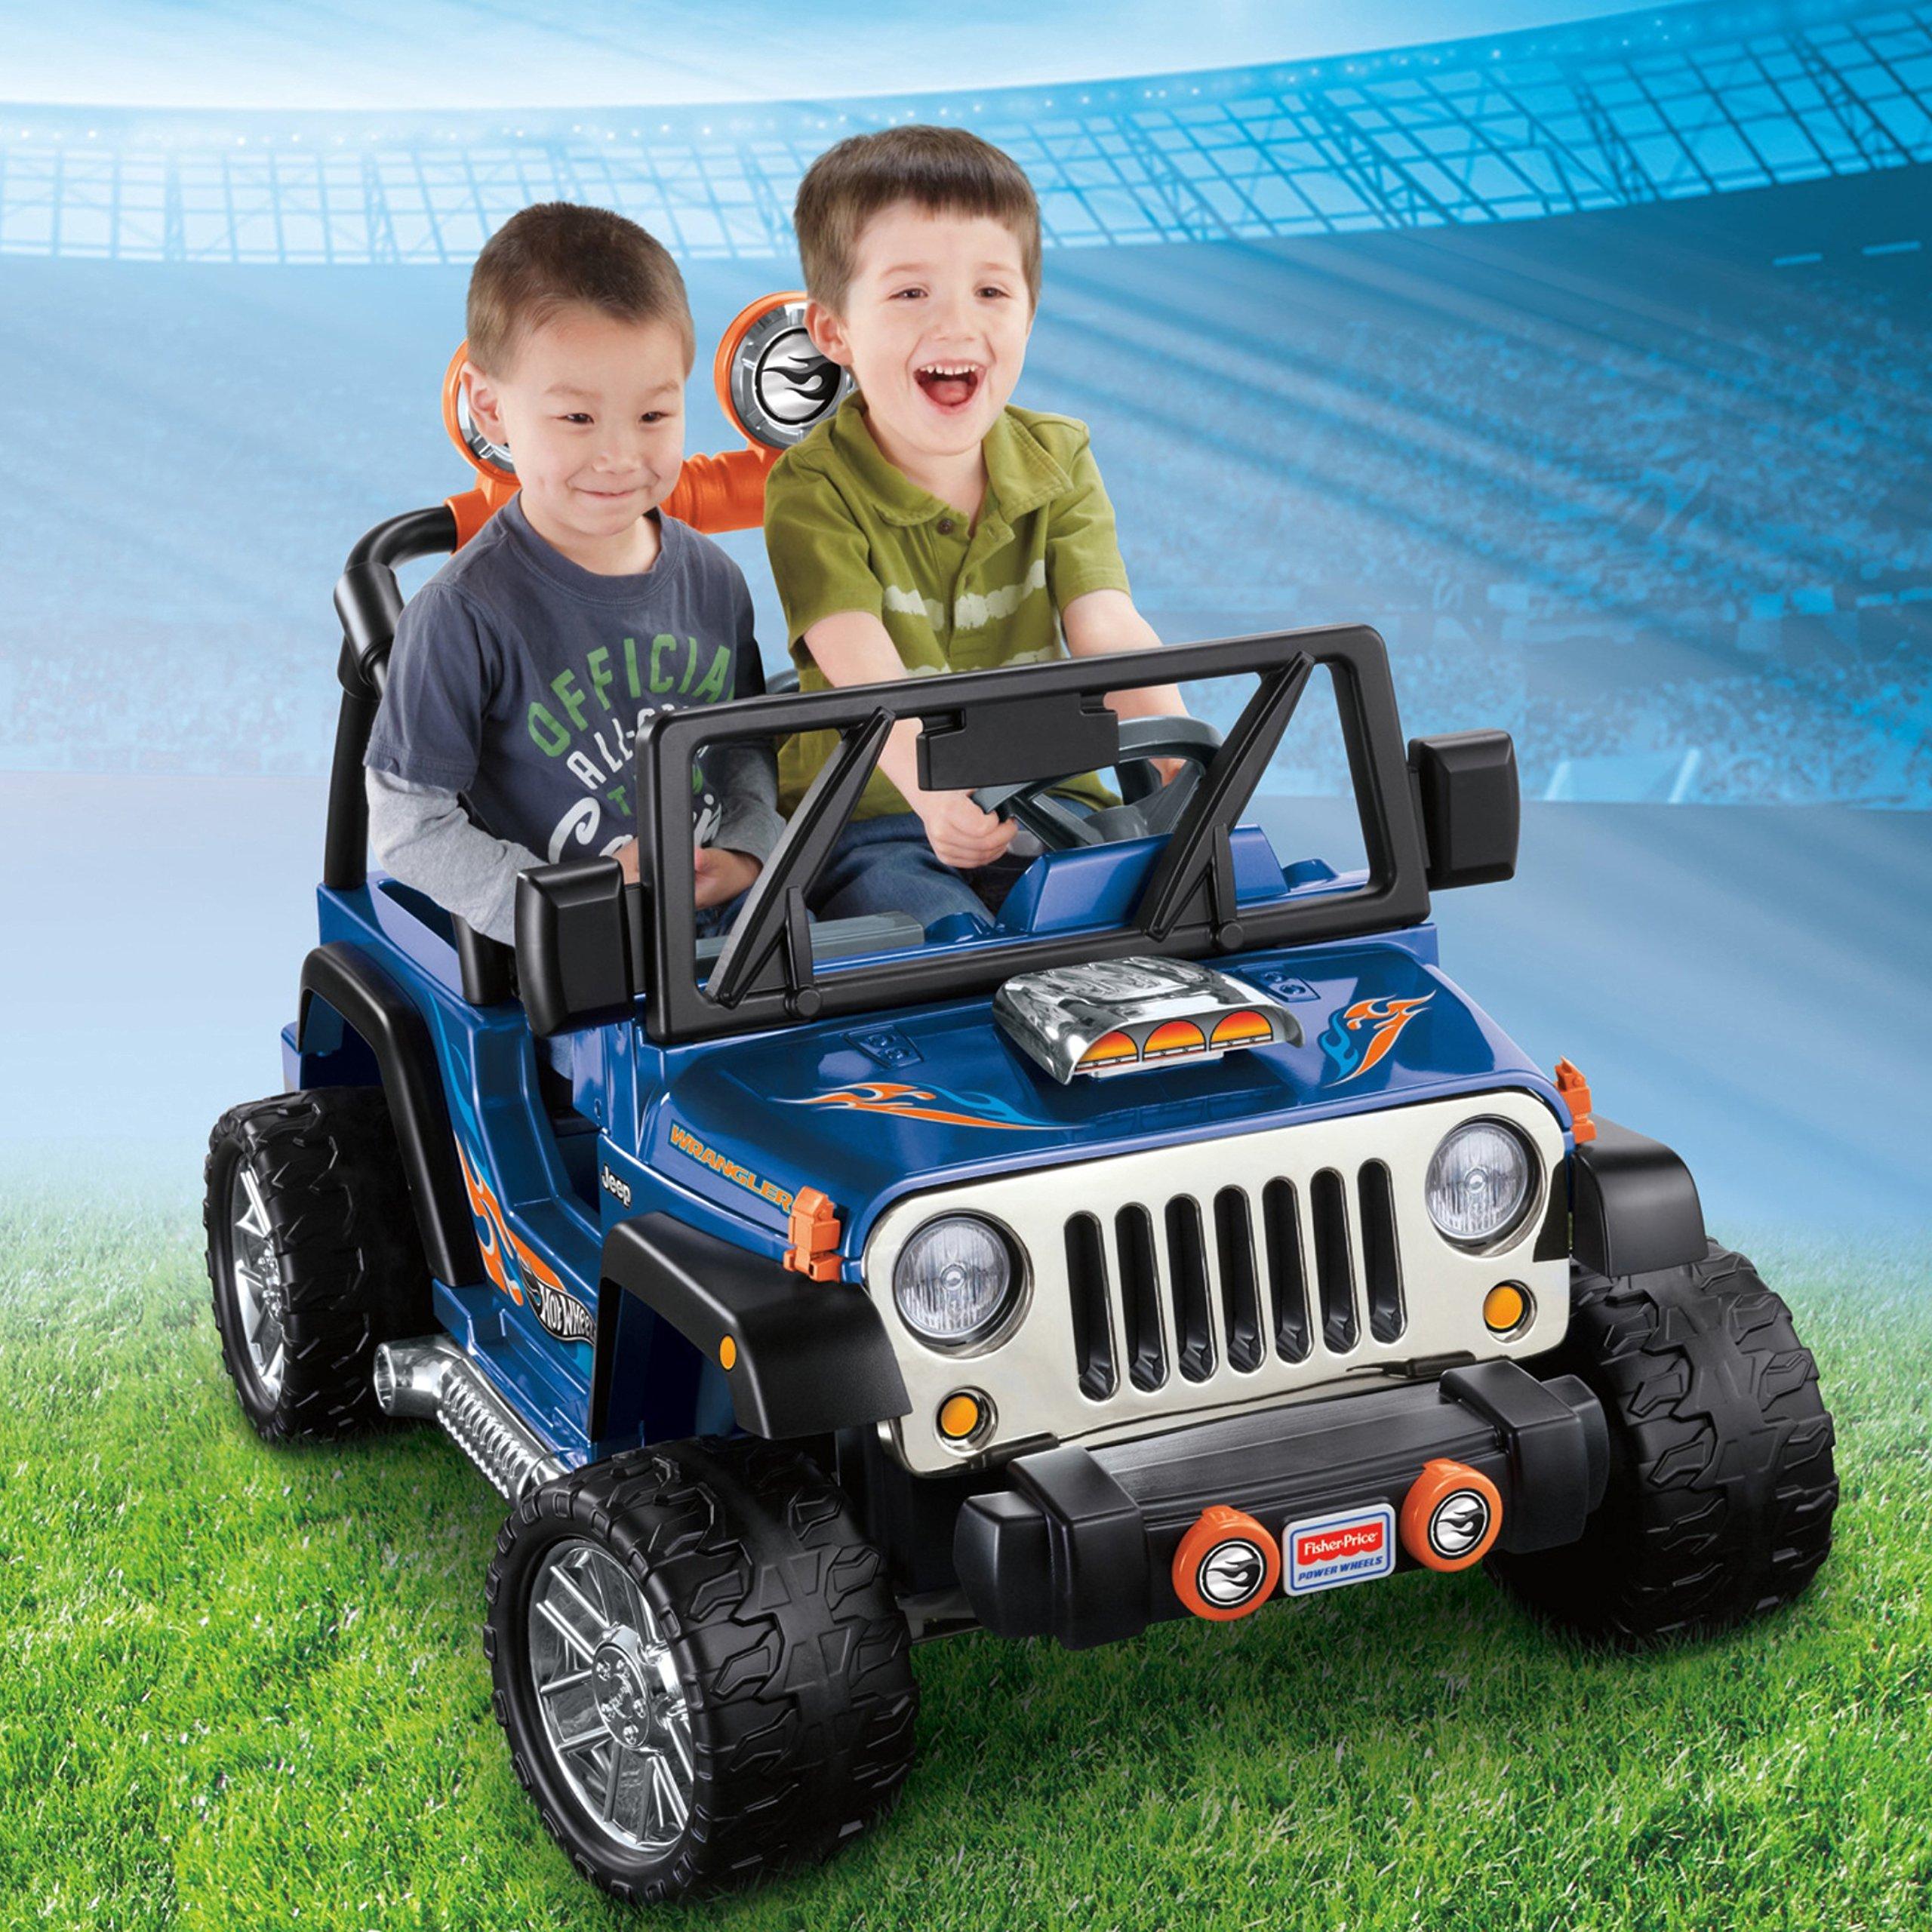 power wheels hot wheels jeep wrangler blue 12v amazon. Black Bedroom Furniture Sets. Home Design Ideas